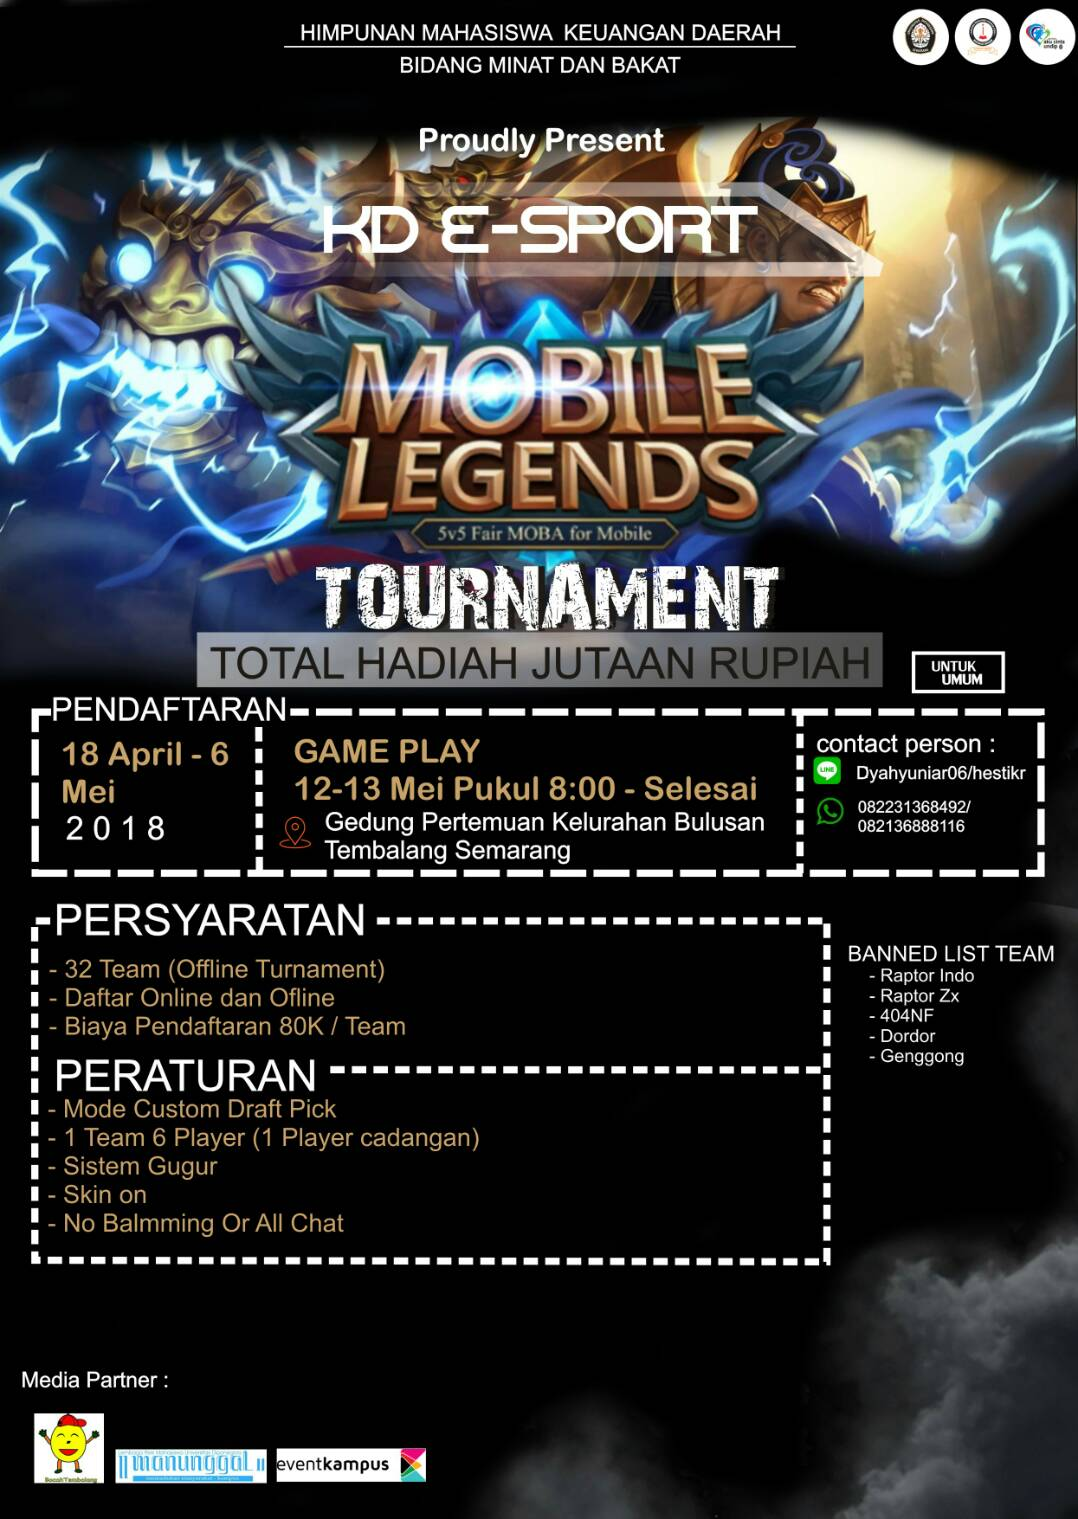 Event Calendar Mobile Legend : Kd e sport mobile legends competition eventkampus